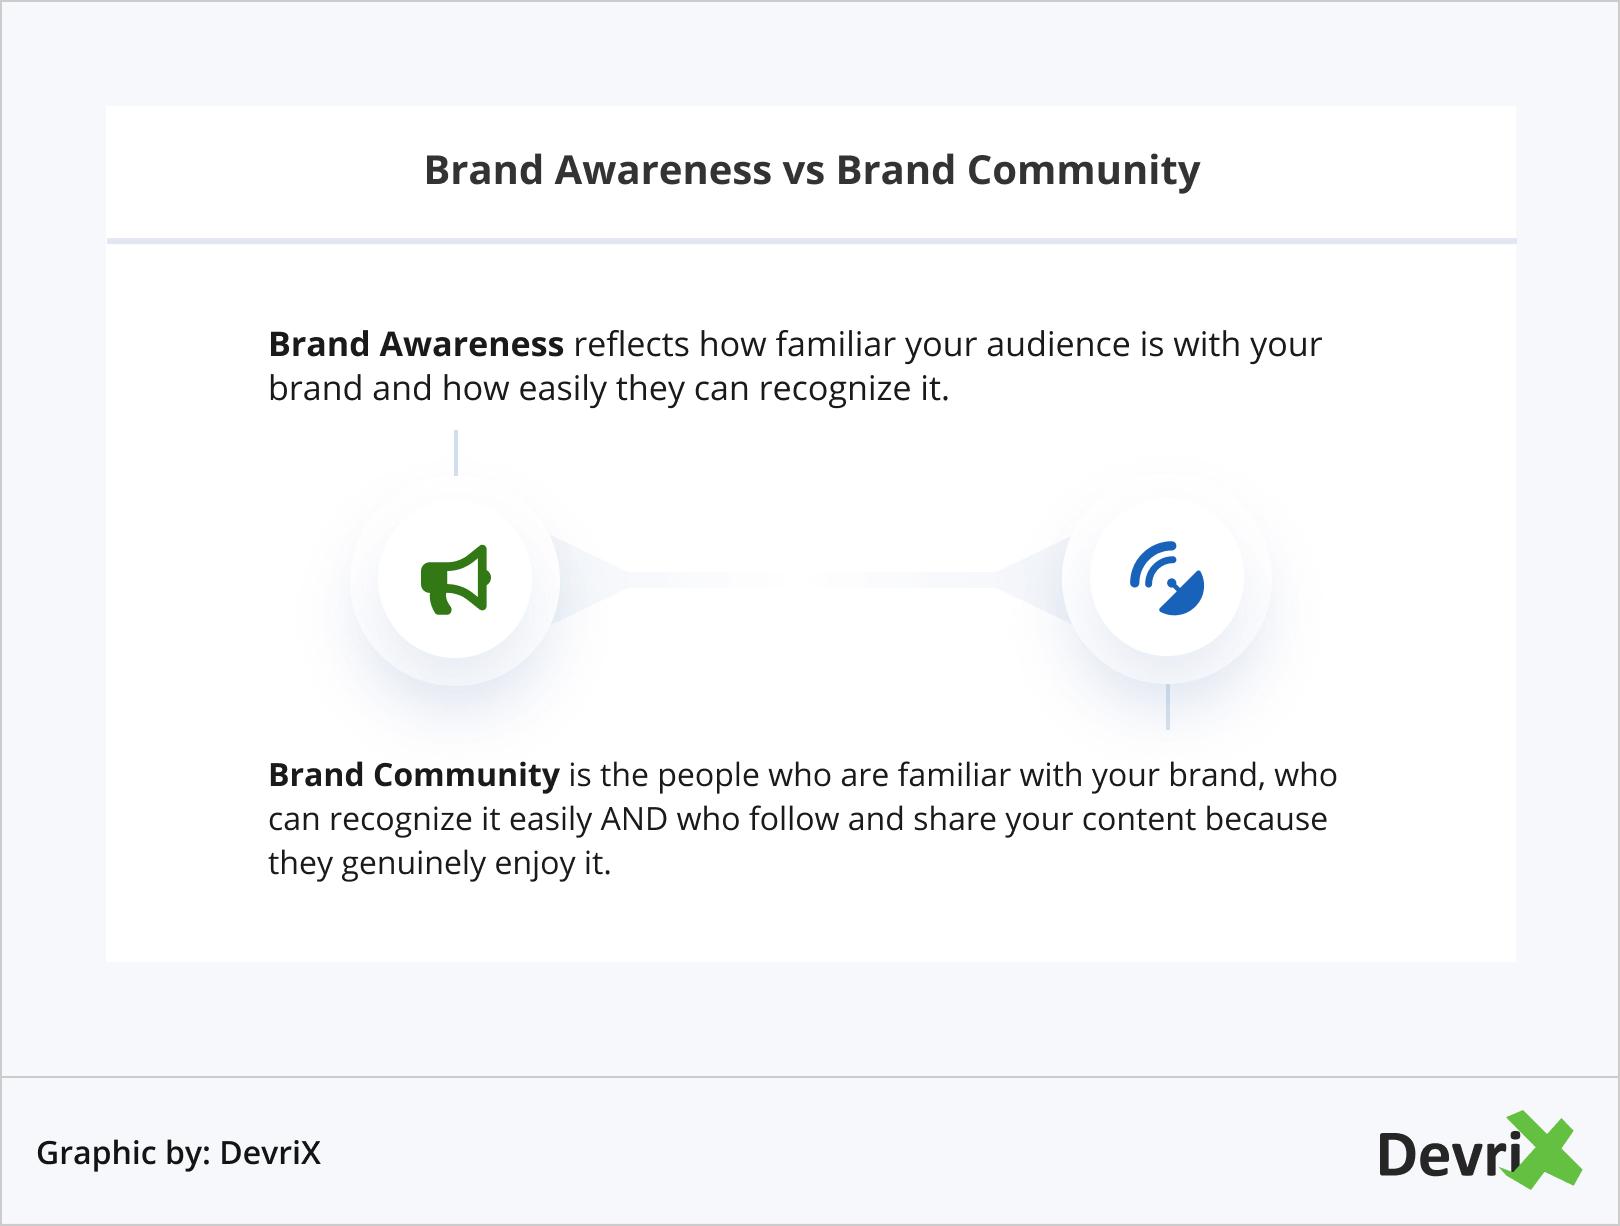 Brand Awareness vs Brand Community